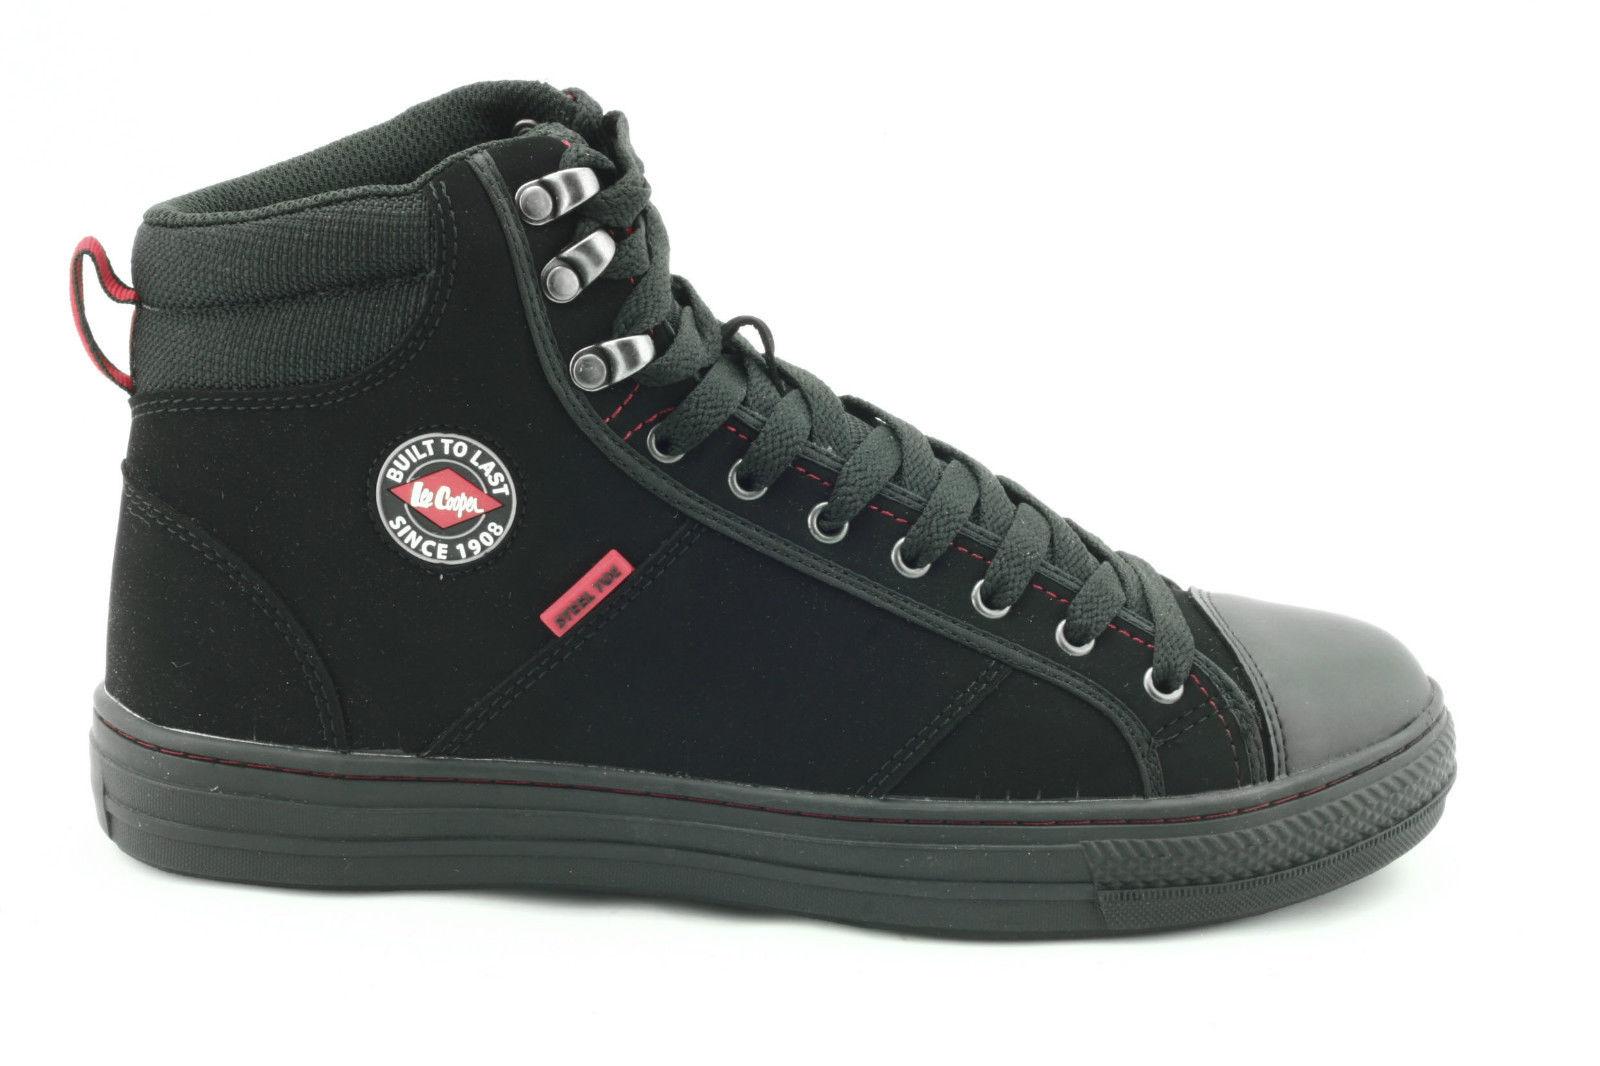 c5c929e35f0 Lee Cooper Work Boot Safety Toe Cap Black